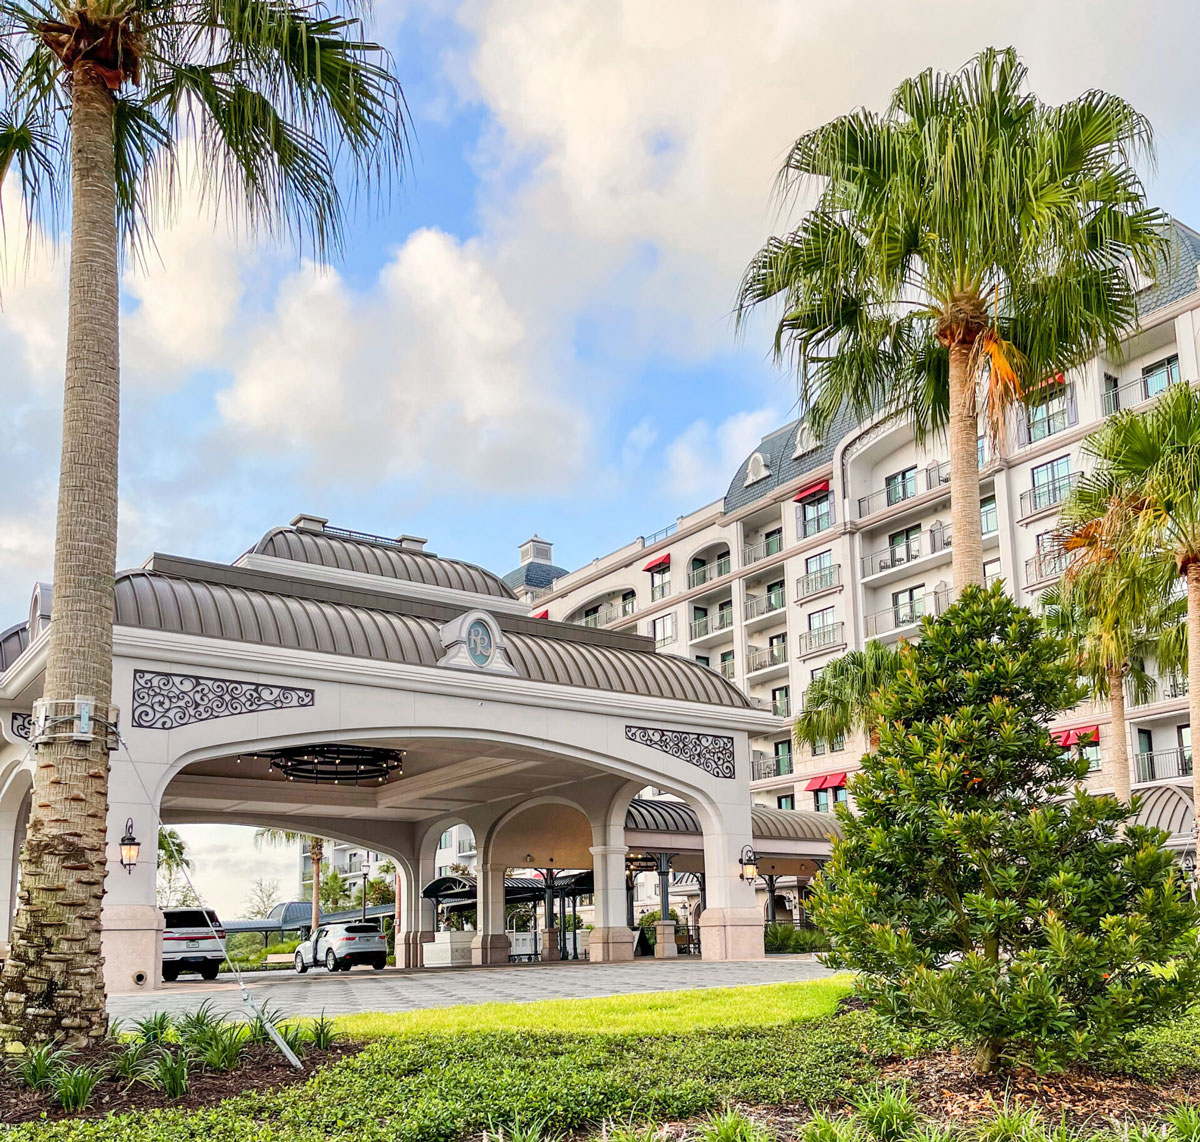 DVC Riviera Resort is Disney's latest resort